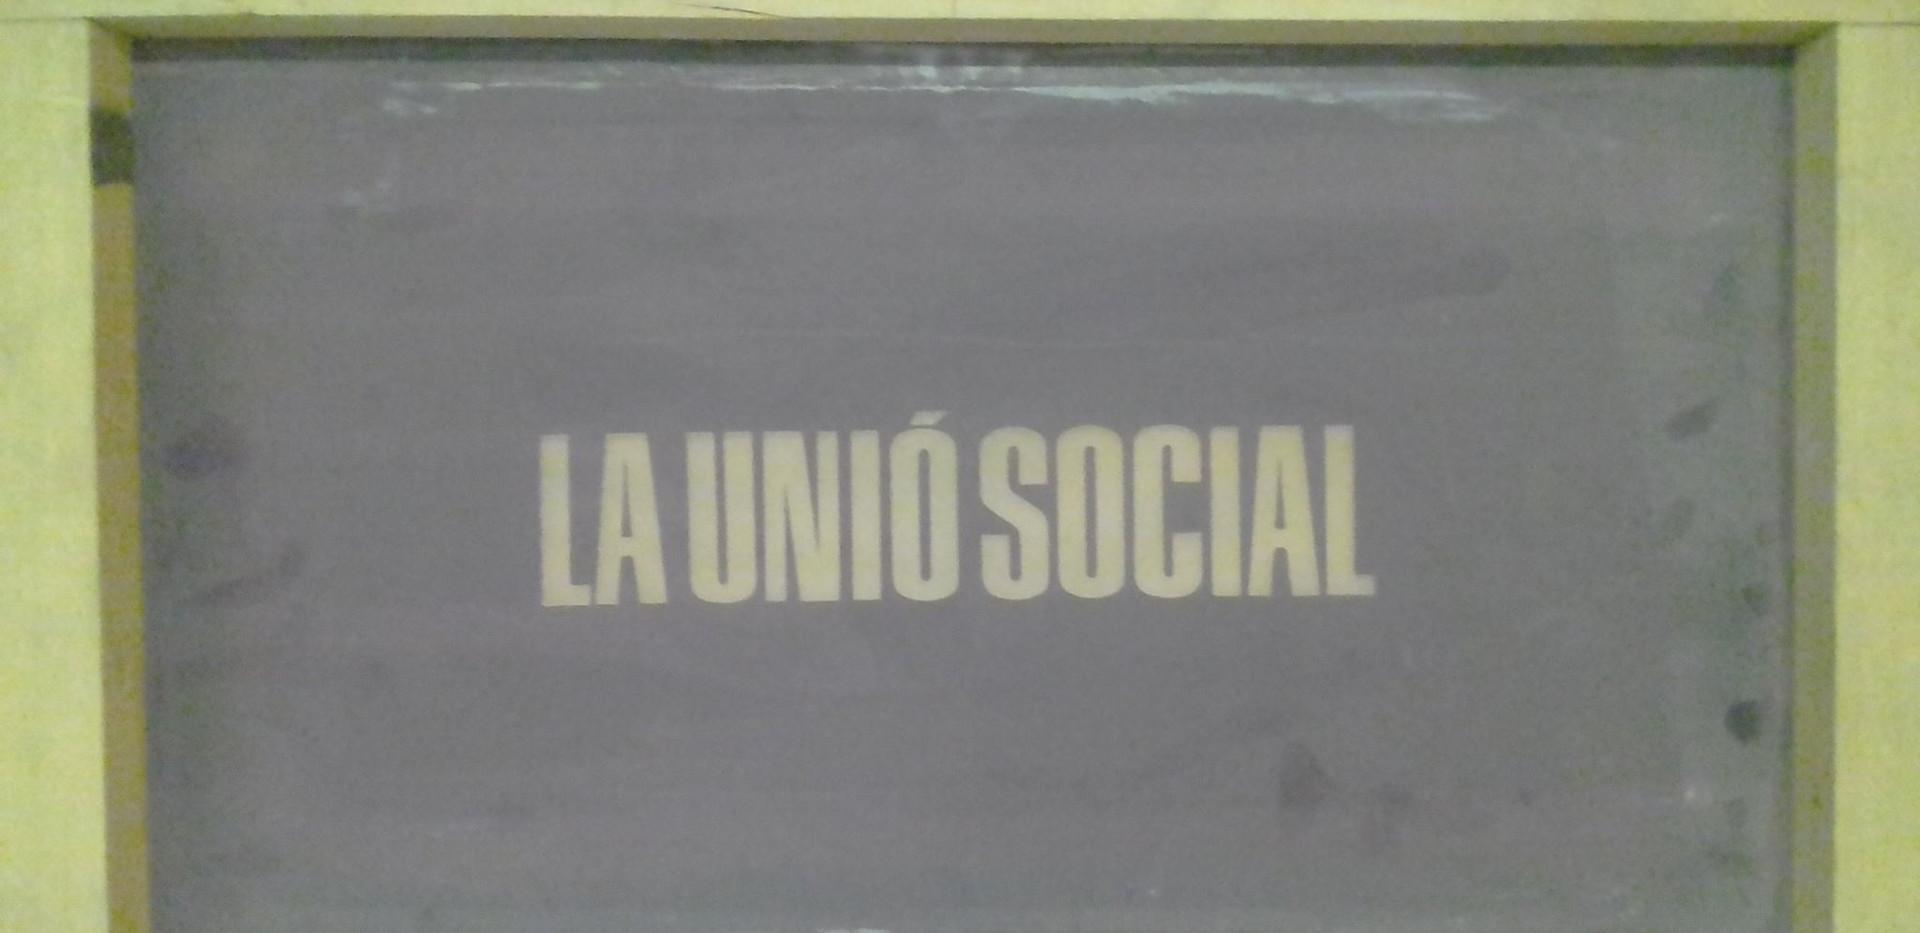 LogoSocial.jpg